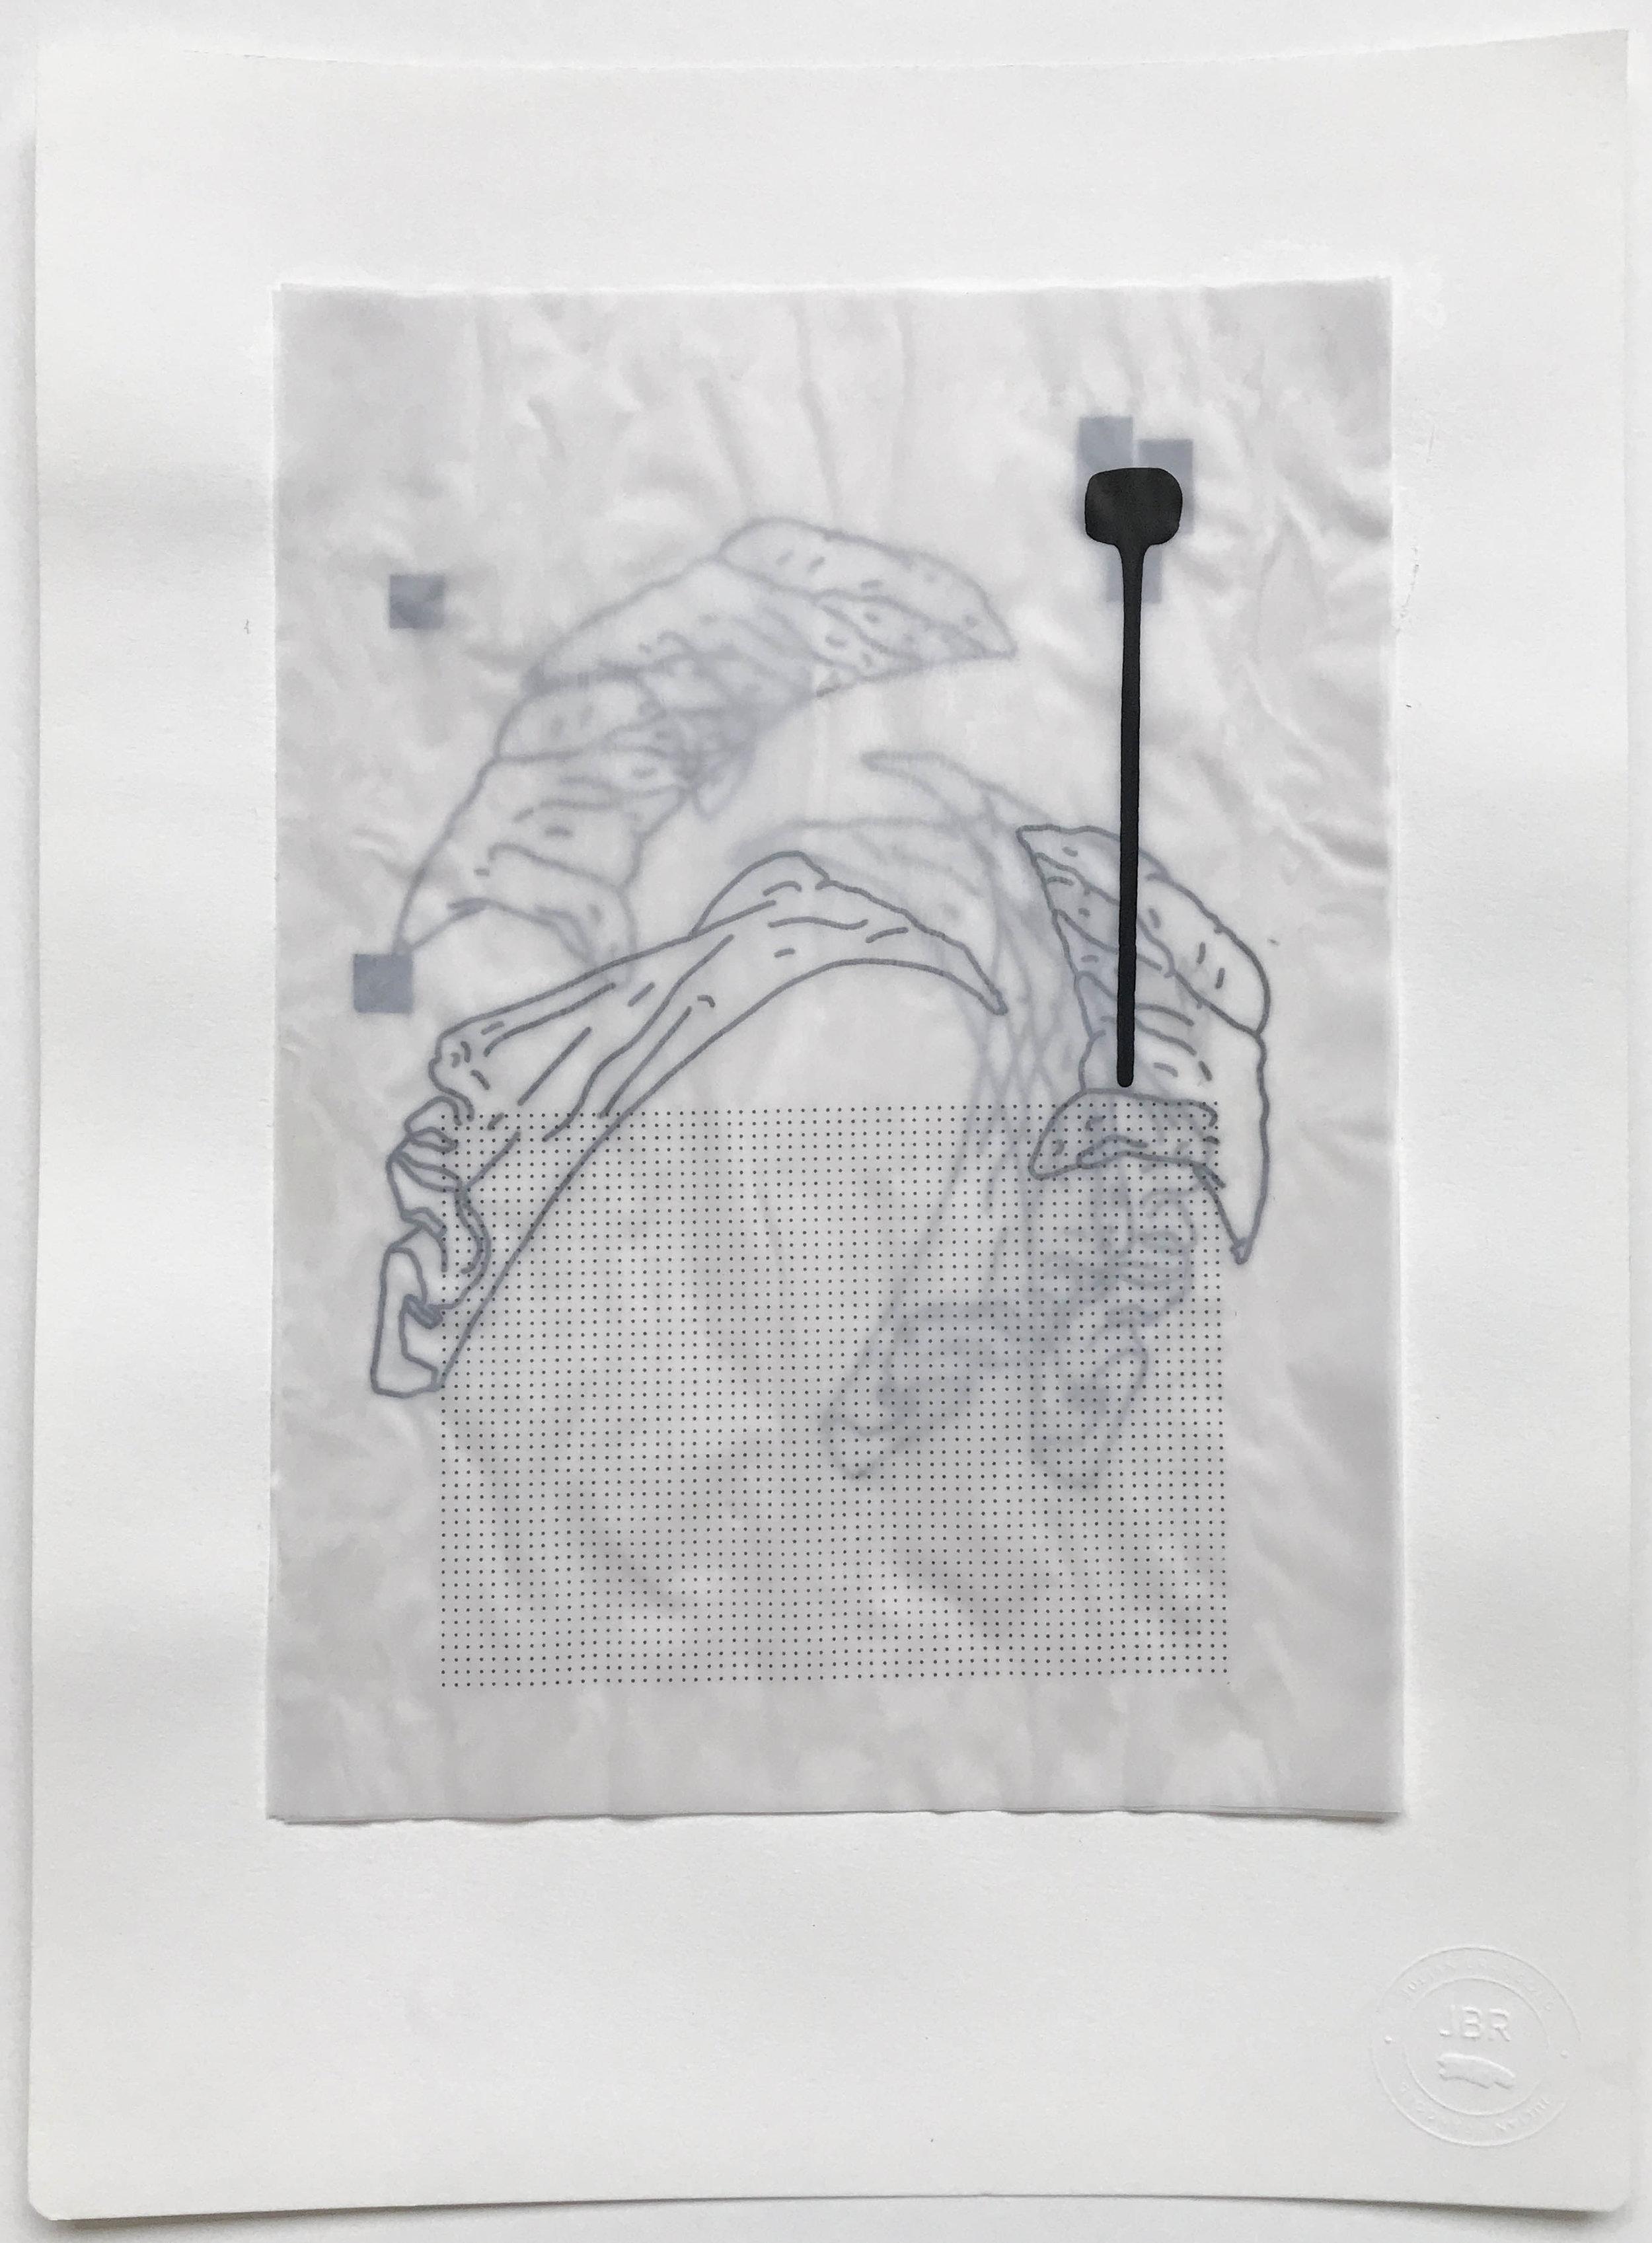 %22Rotación%22- Técnica mixta  - 42 x 30 cm - Julián Brangold - 2018.jpg